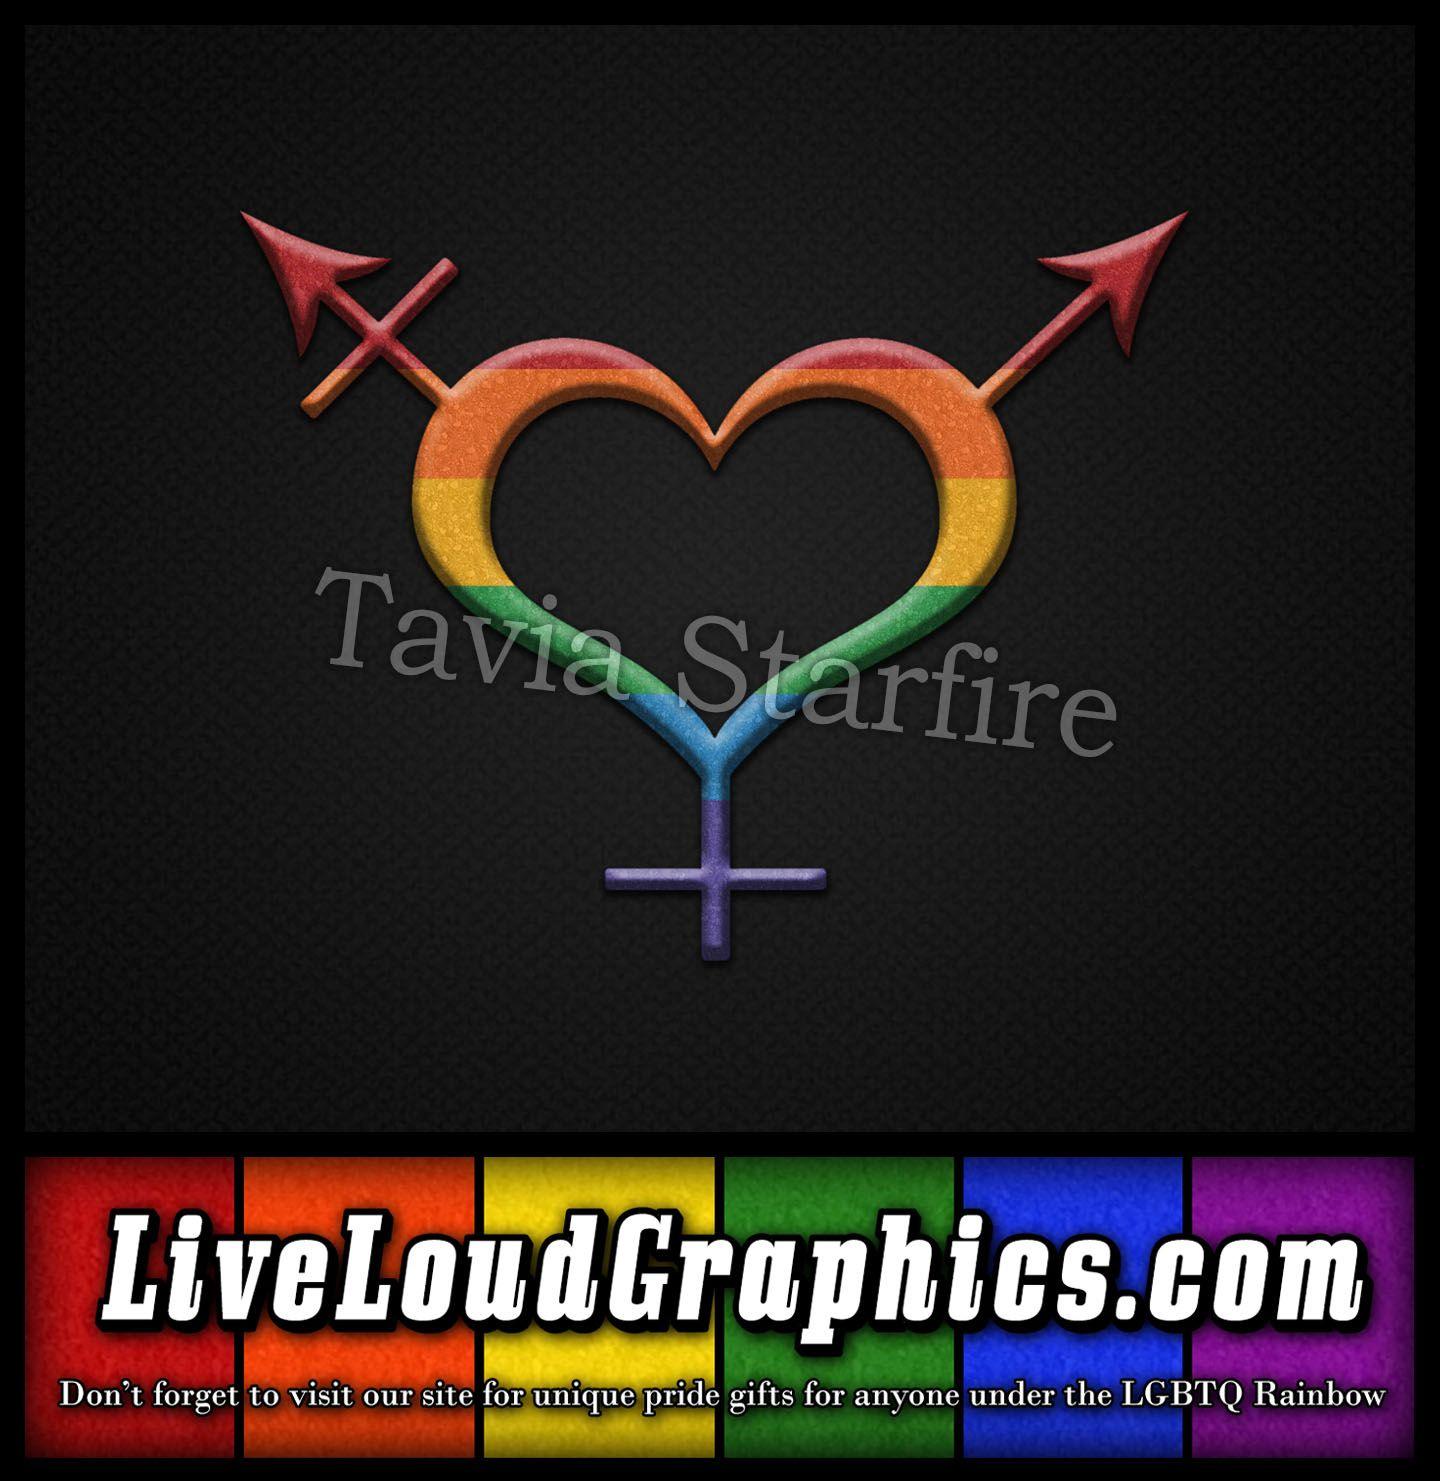 Pin on Transgender Pride - Live Loud Graphics